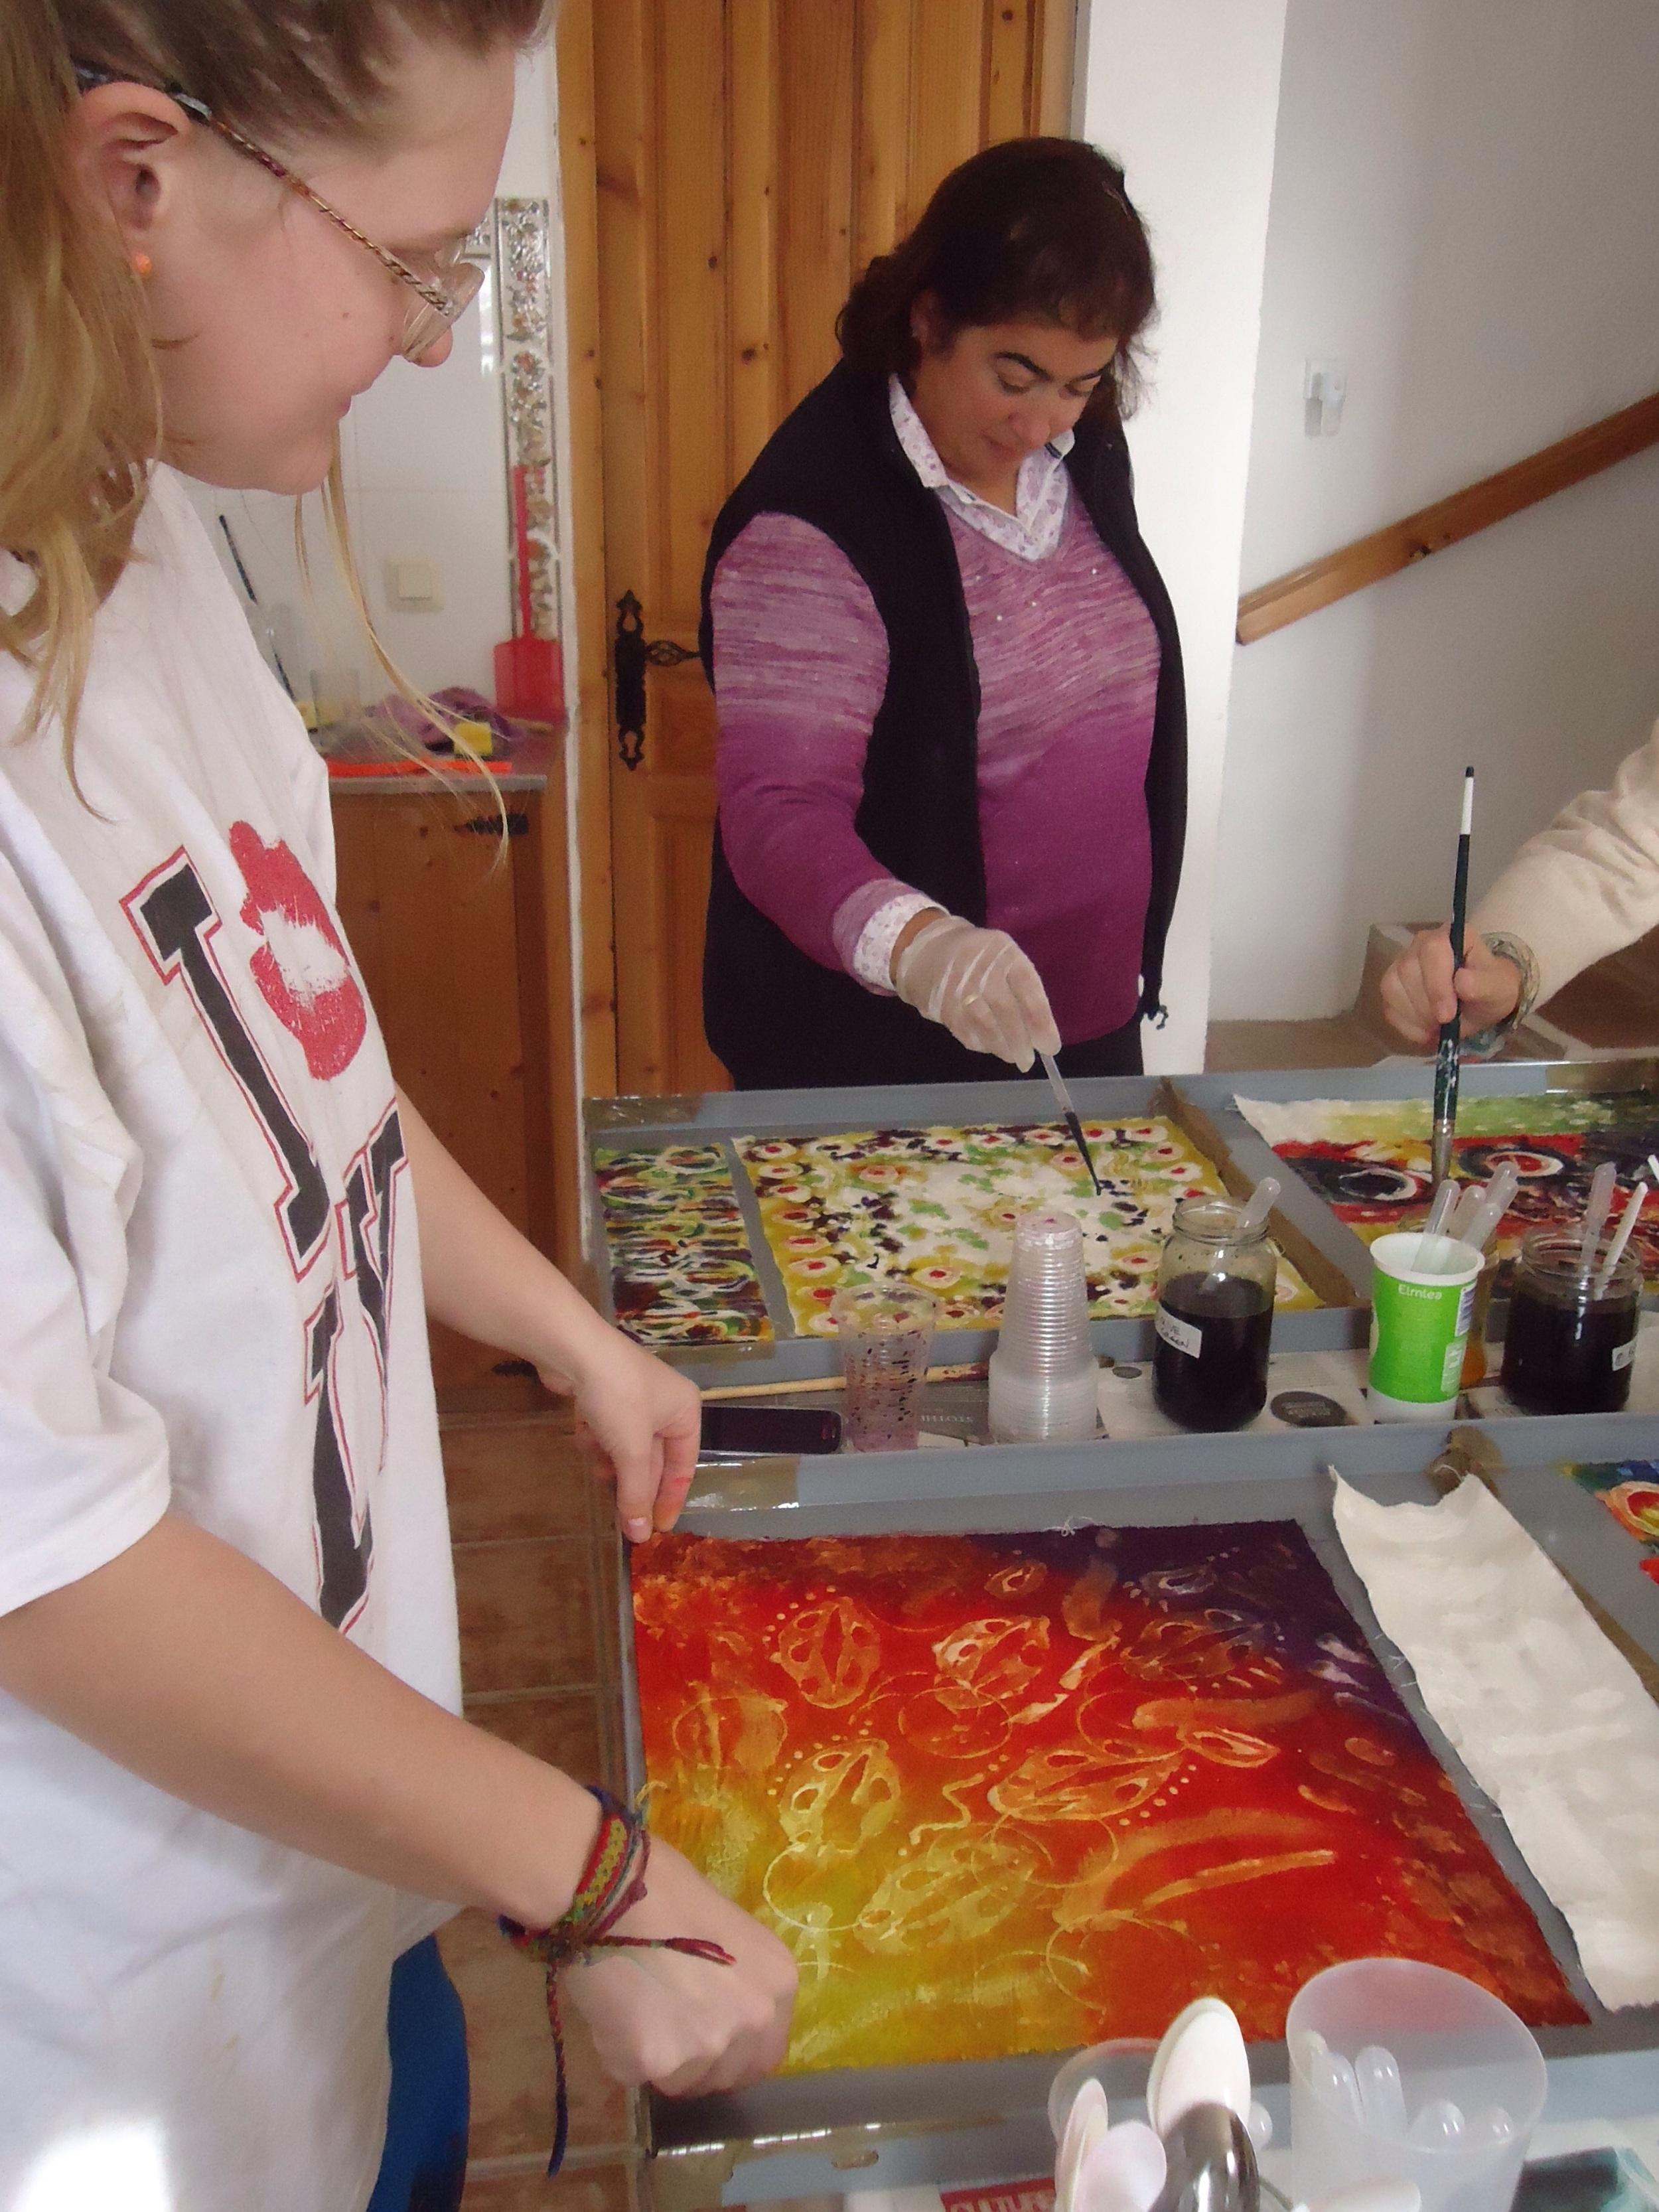 Applying dyes